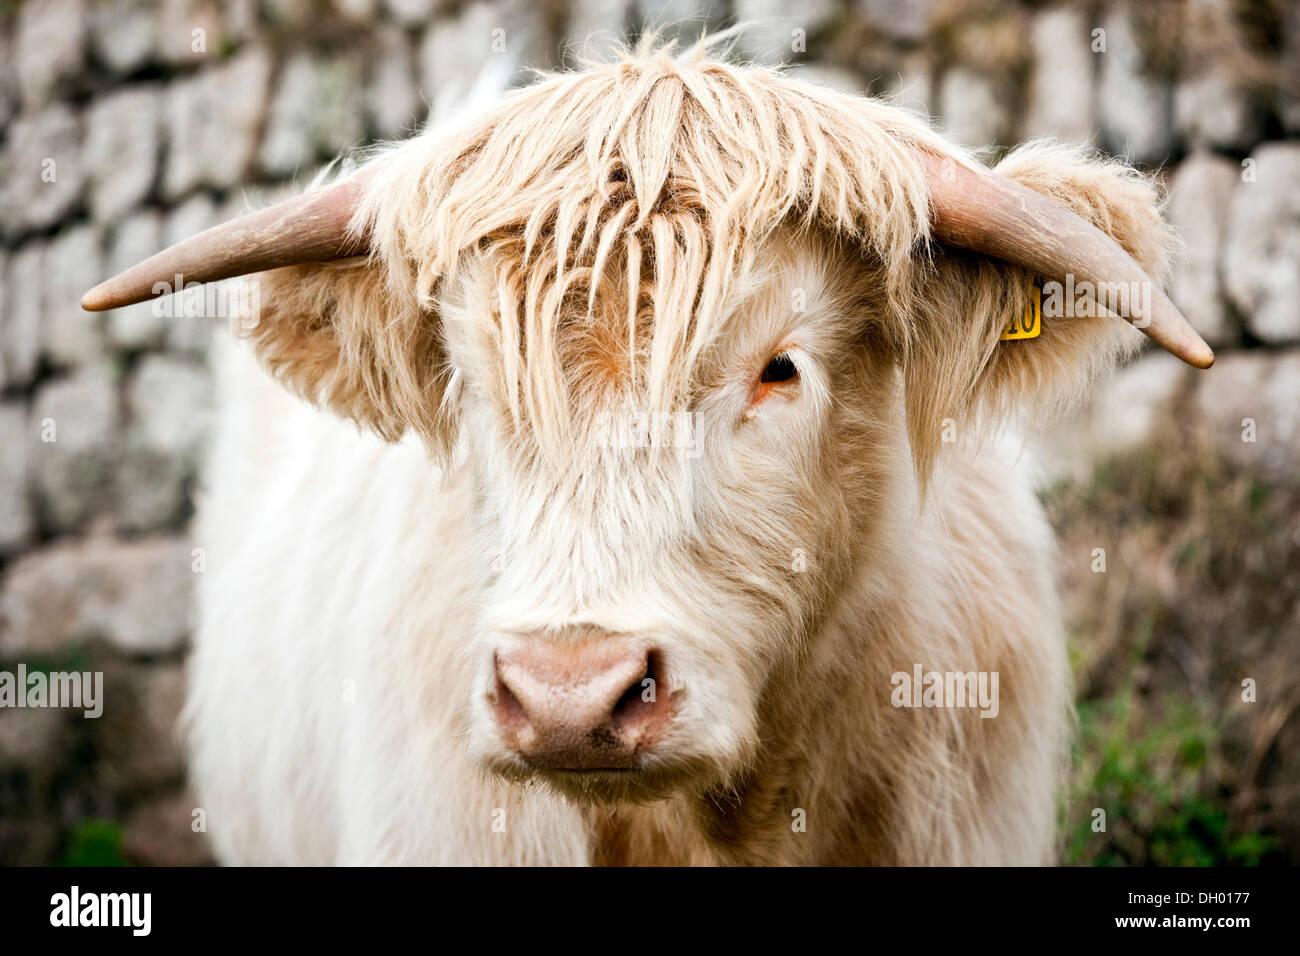 Scottish Highland Cattle, young bull, mixed-breed, Cornwall, England, United Kingdom - Stock Image